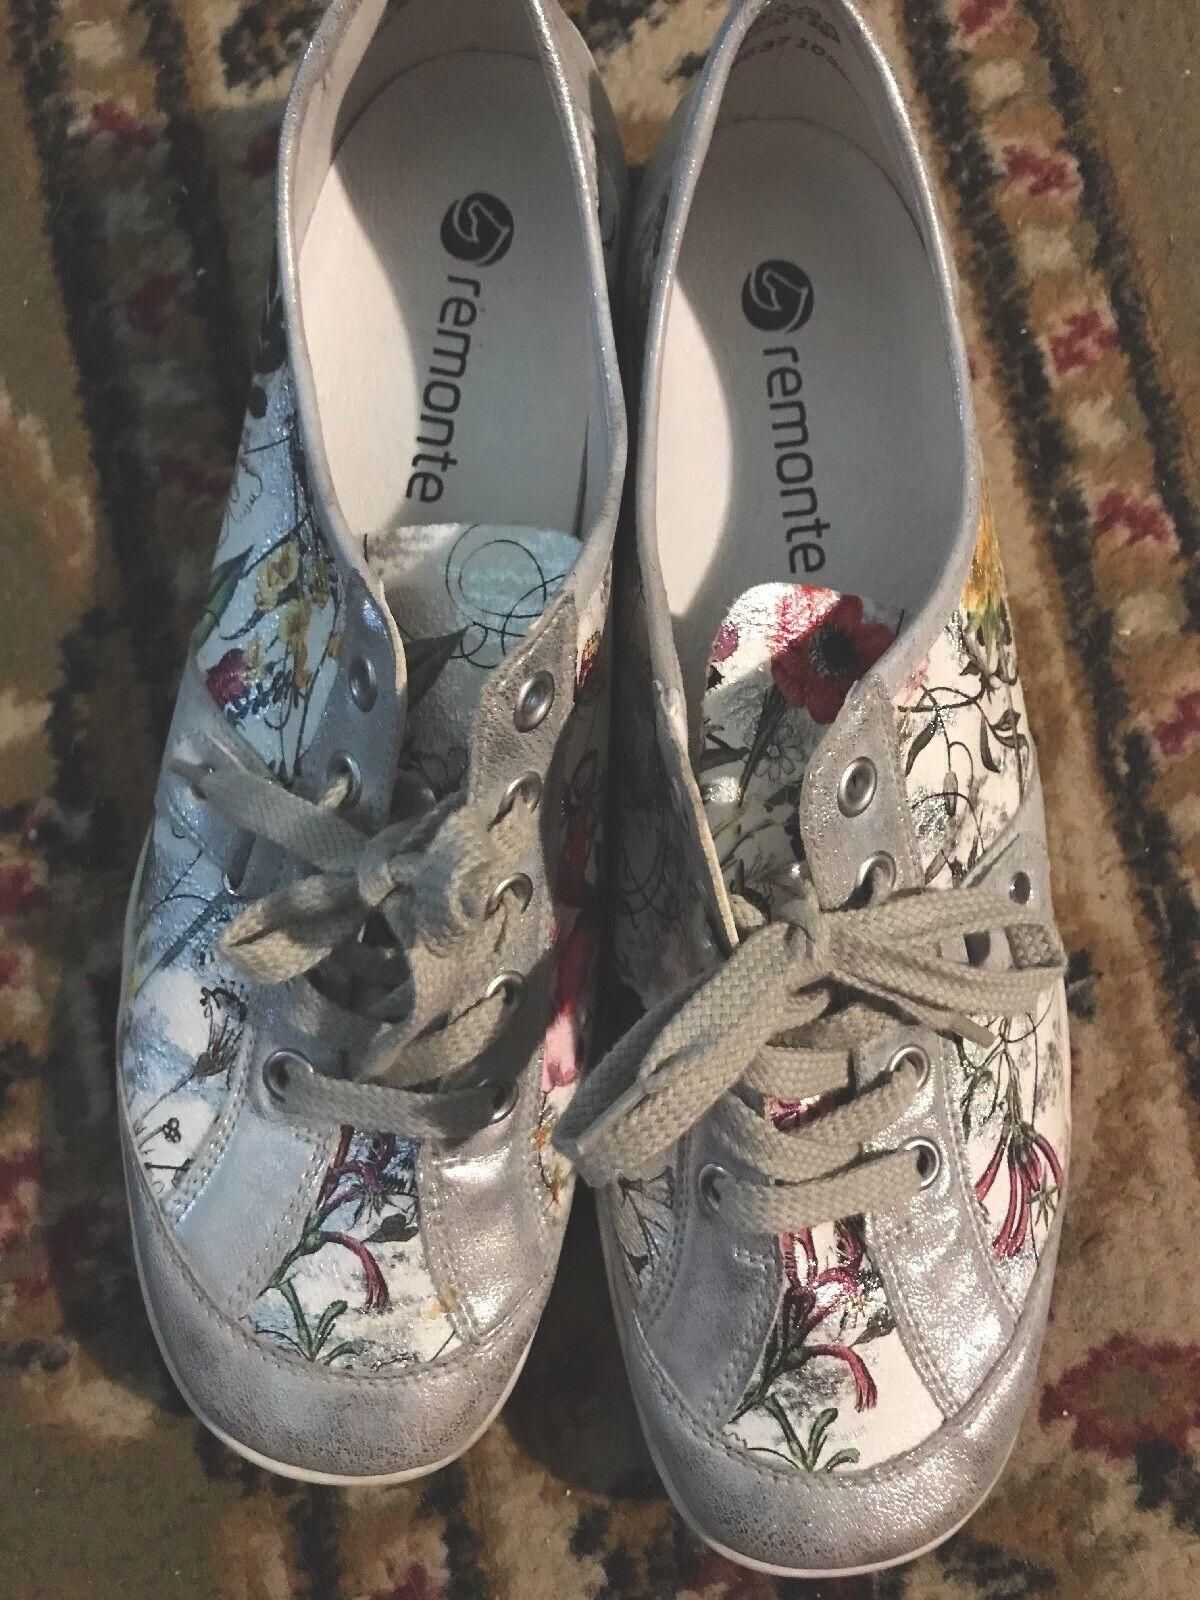 Leder Metallic Sz 'Remonte' Floral Lace Up Sneakers . Sz Metallic 10 - 10.5 26eb22